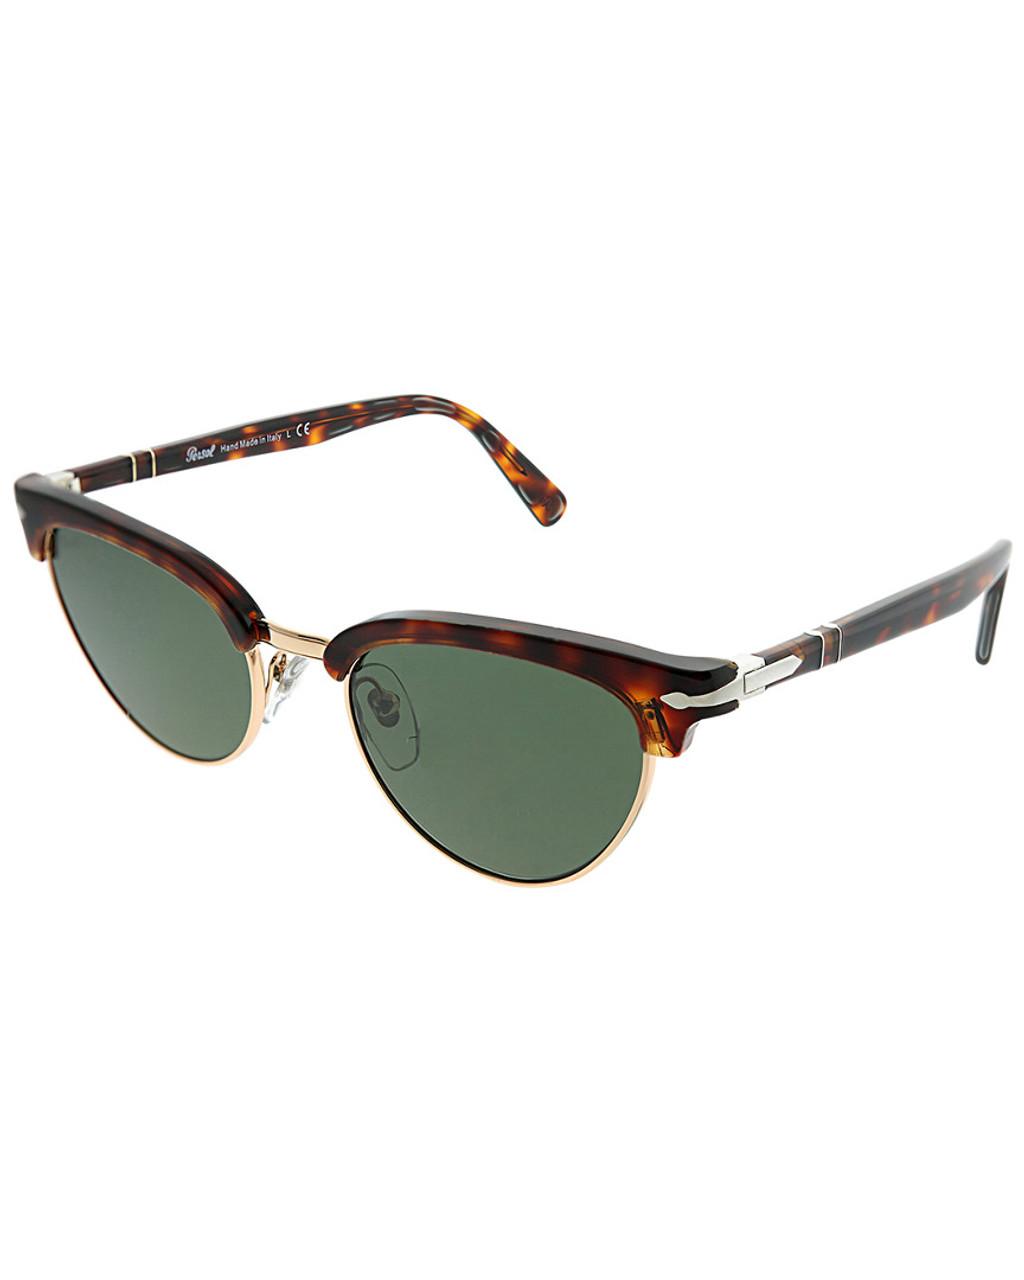 2cdb8a0c2b3f Persol Women s Cat-eye 51mm Sunglasses~1111894955 - Carsons